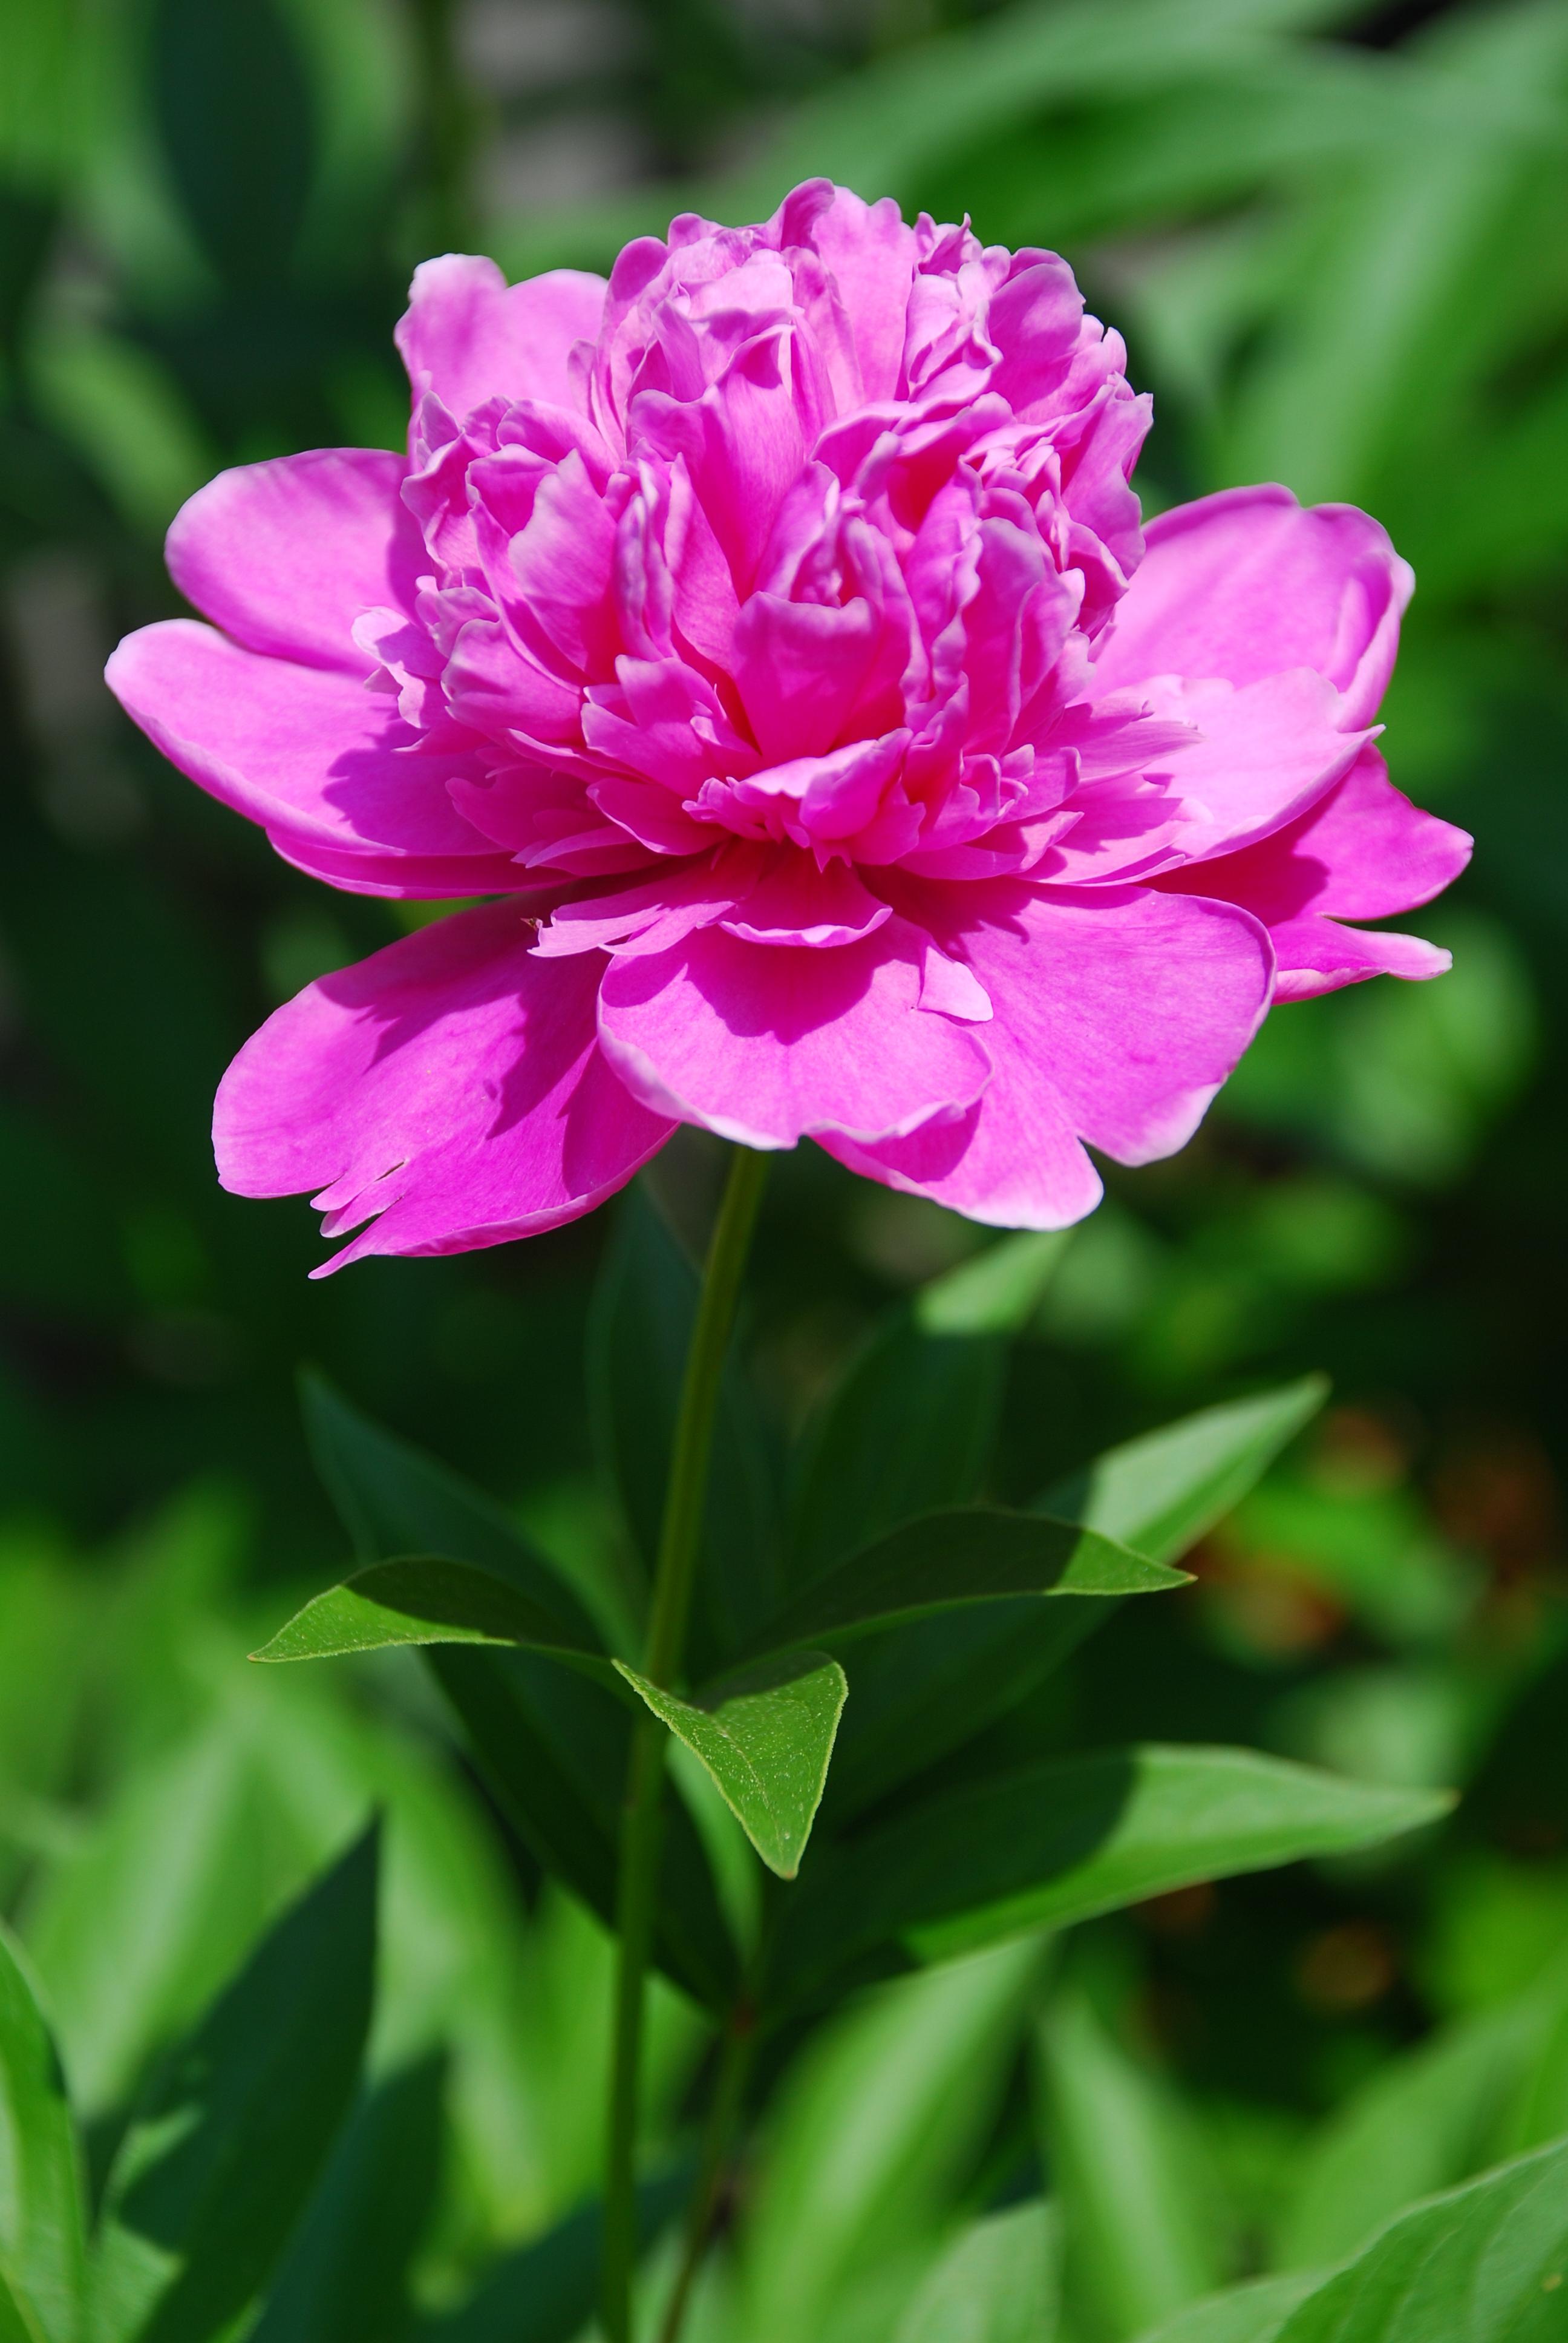 ... Chinese bellflower , peacock flower (aka aster) and pink peonies